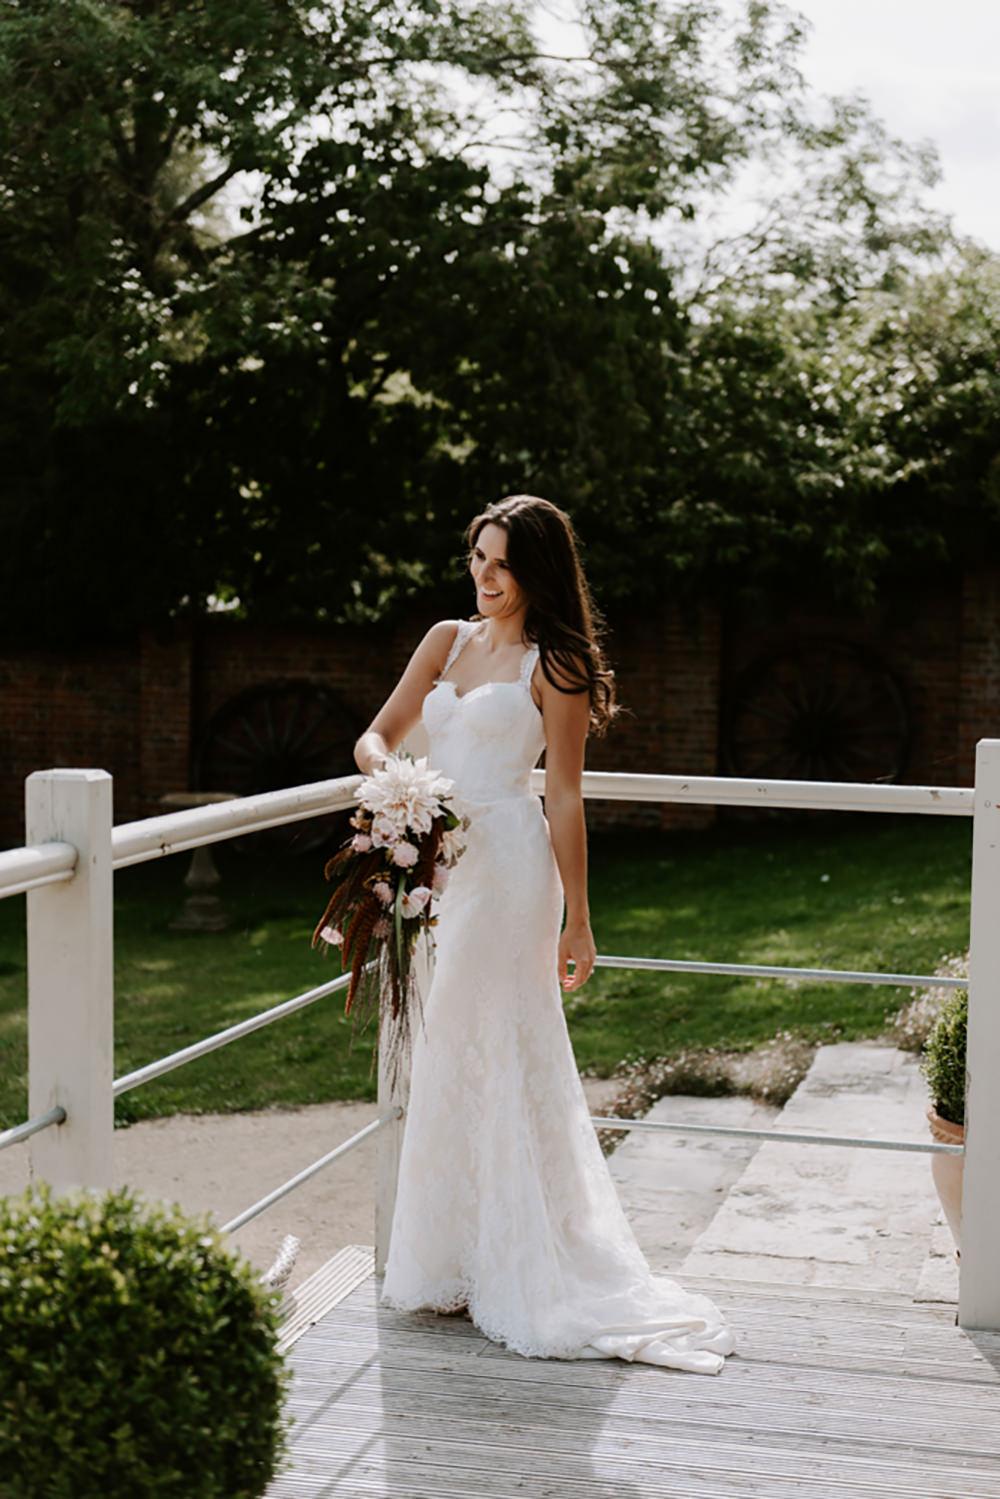 Bride Bridal Dress Gown Lace Straps Train Ethical Wedding Ideas Sadie Osborne Photography